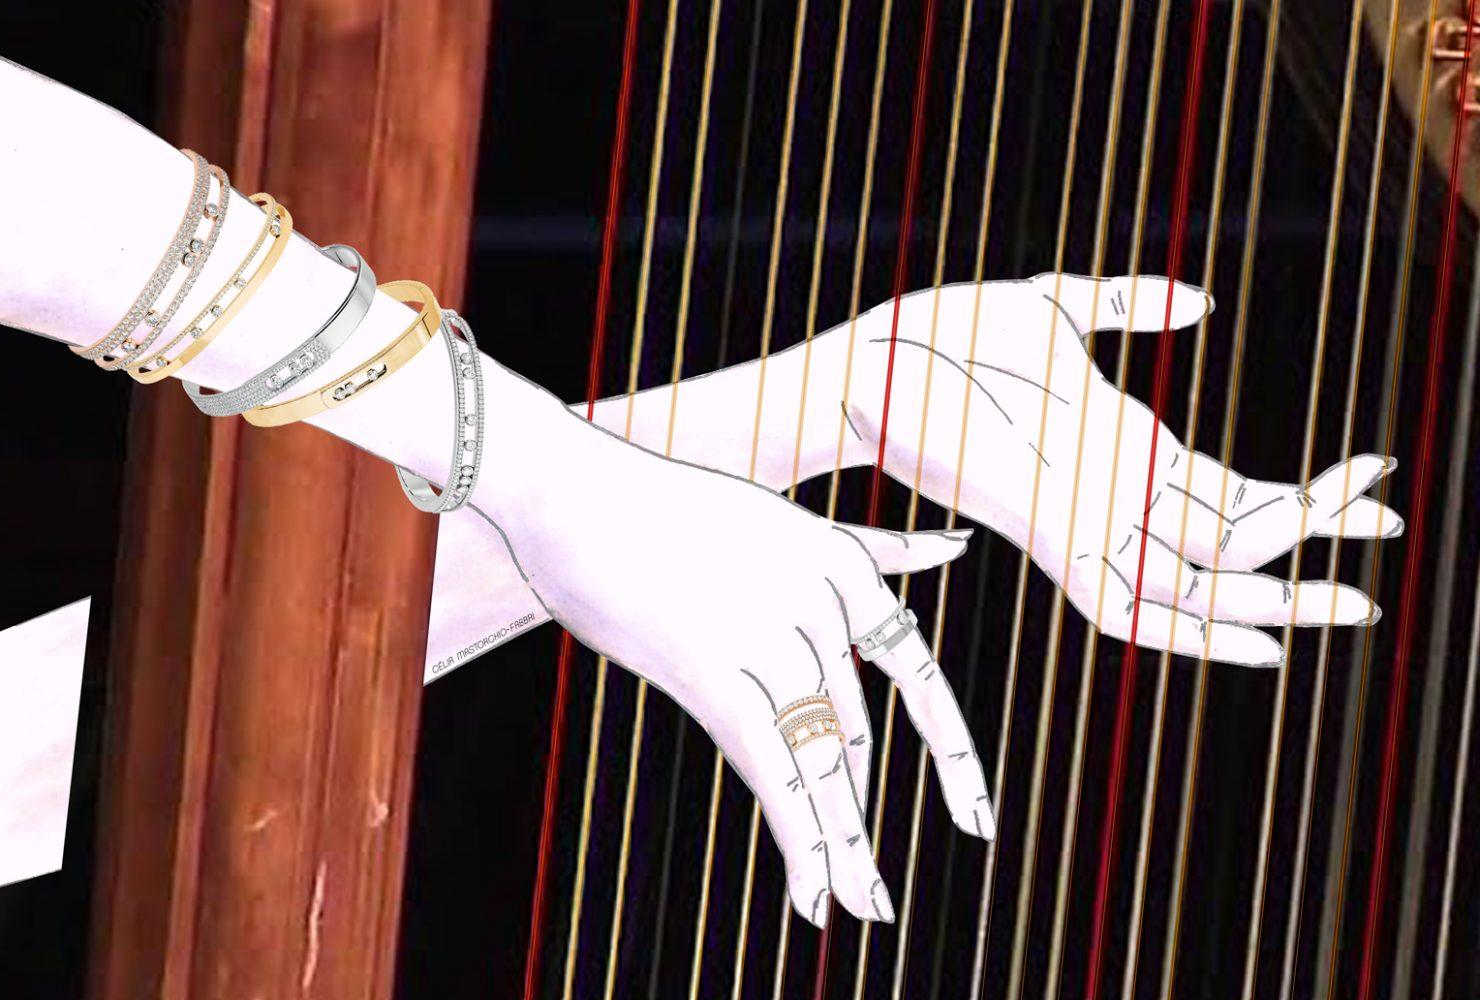 celia-mastorchio-fabbri-illustration-jewelry-messika-move-bracelets-rings-noa-romane